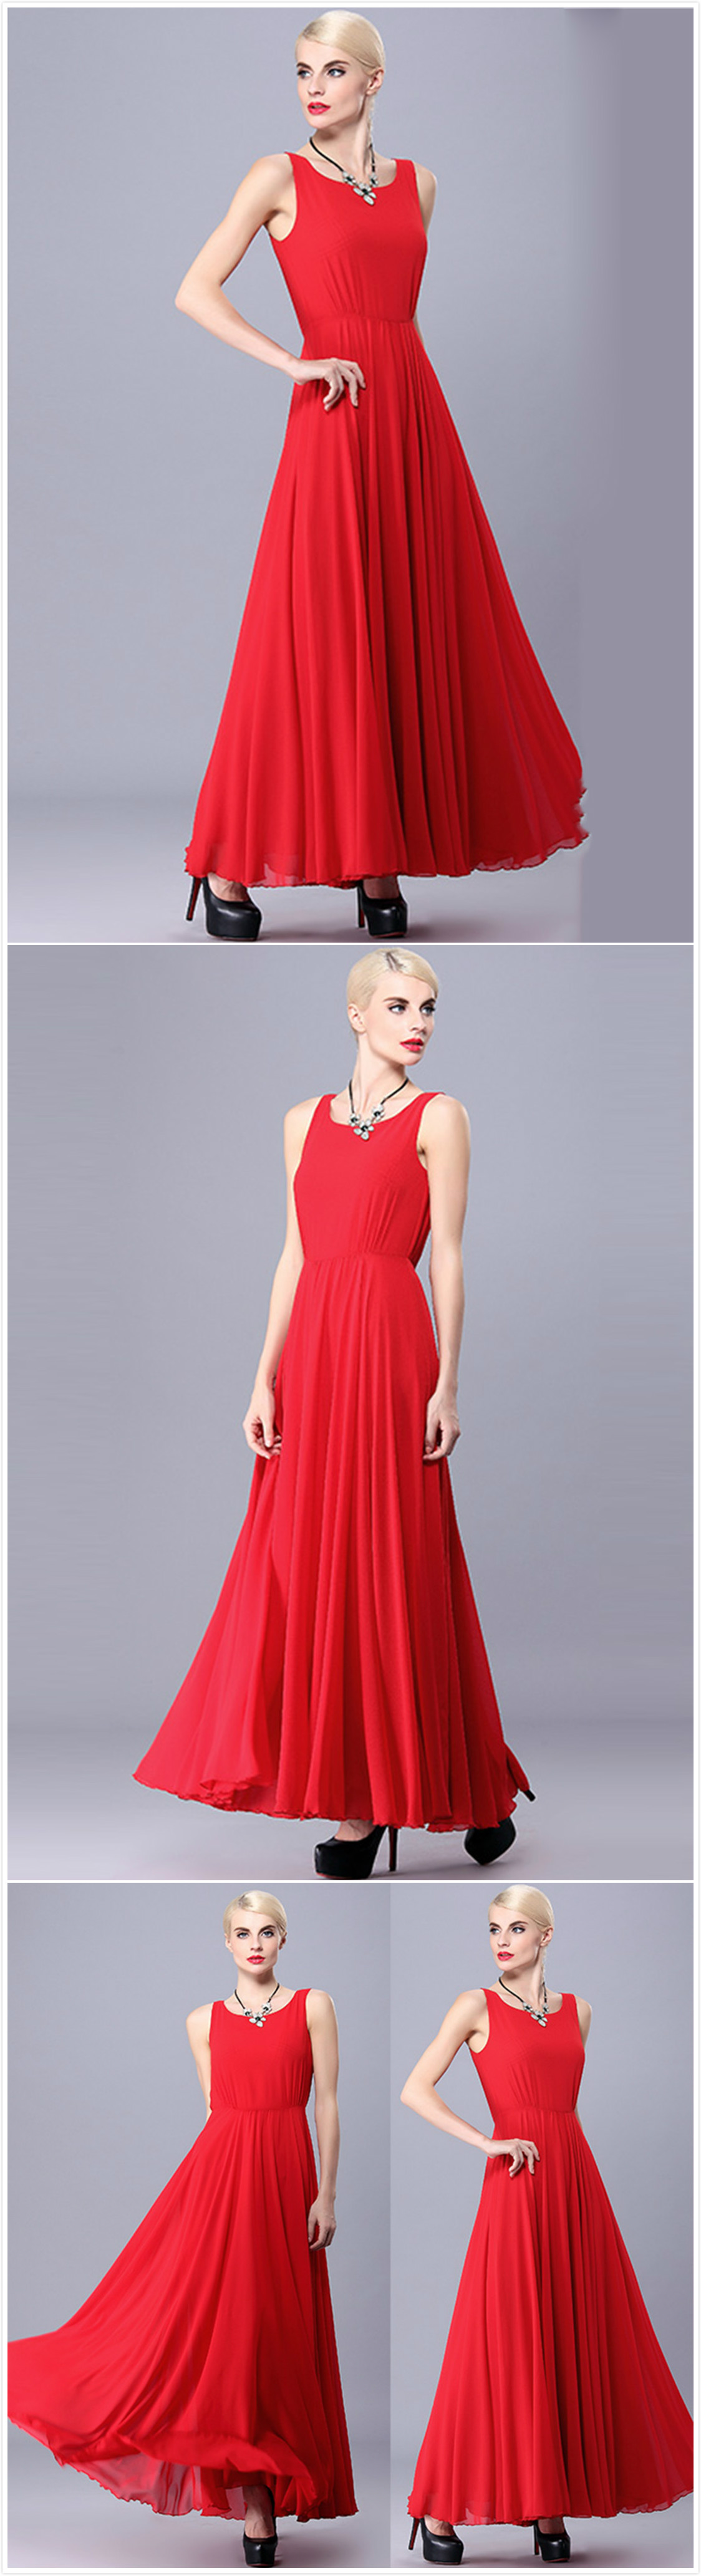 Sleeveless maxi evening wedding prom chiffon dress azbro